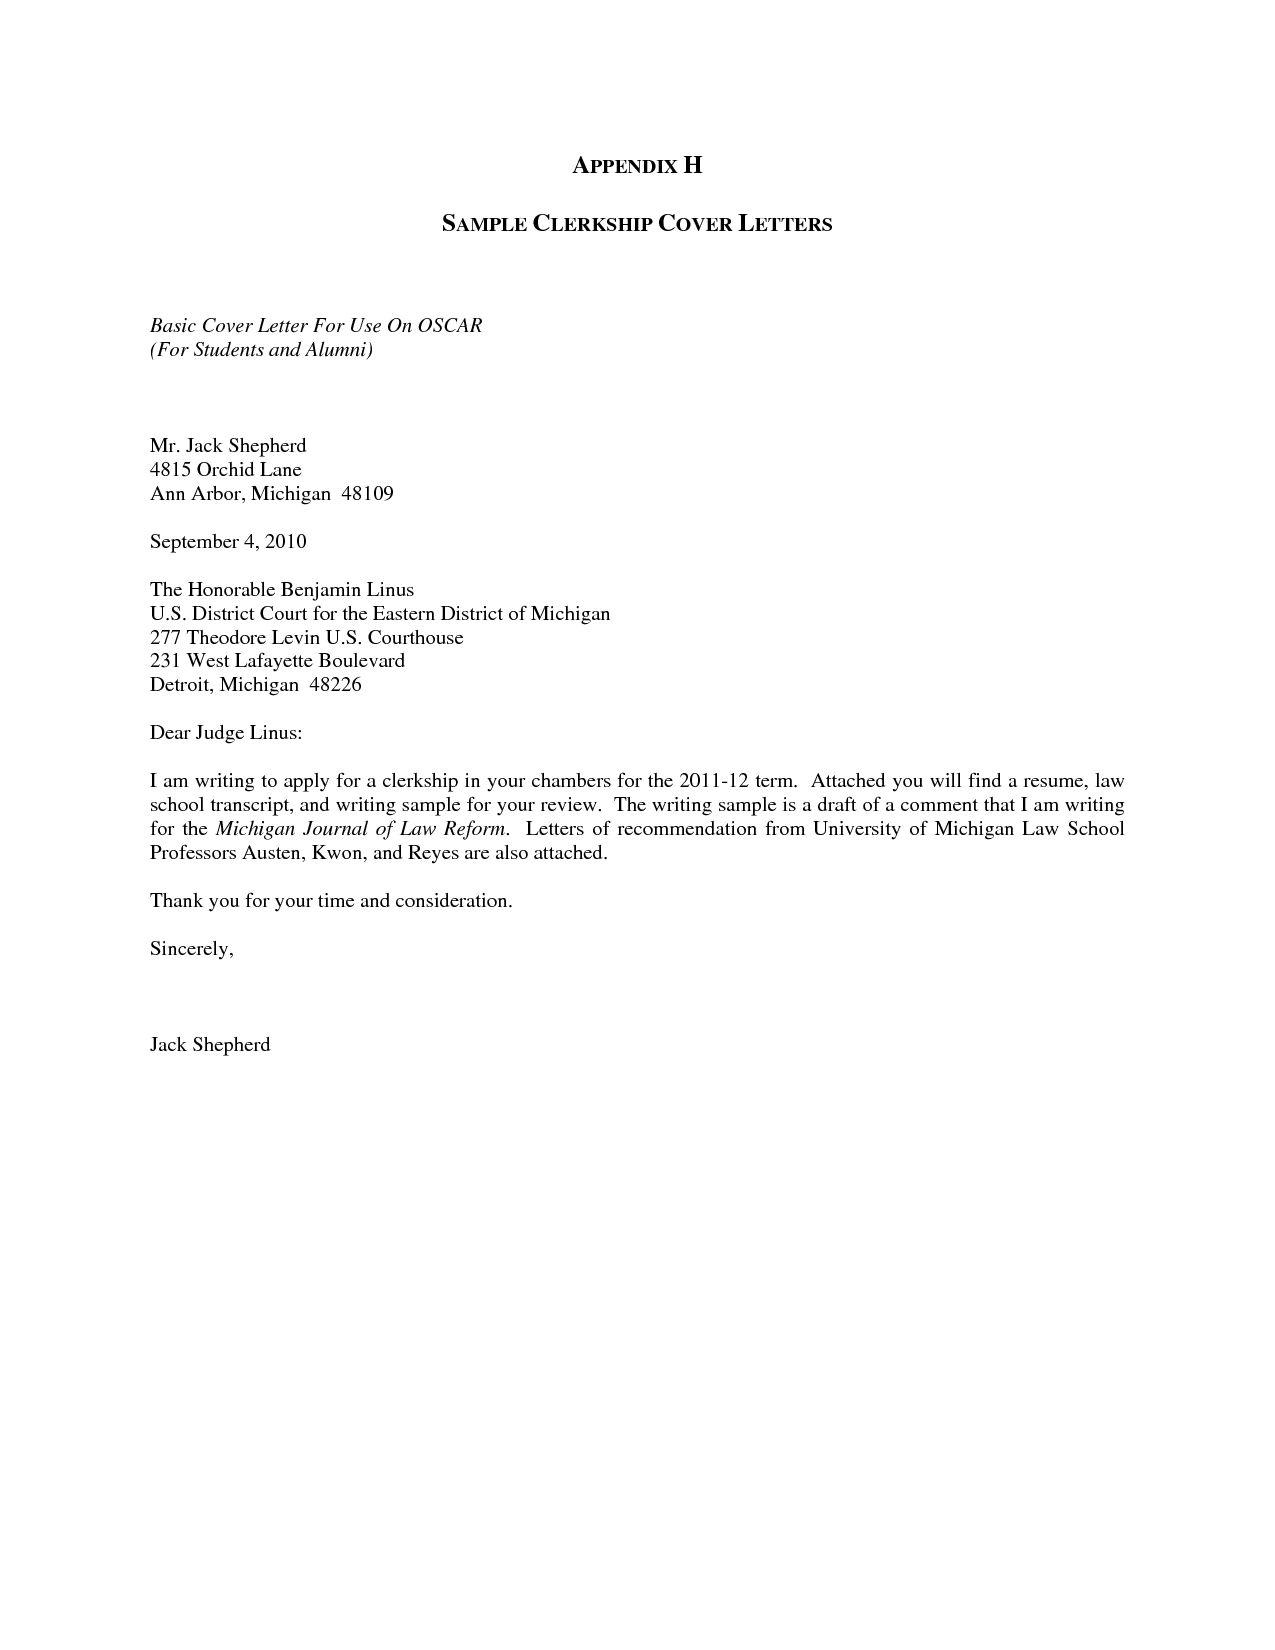 Samples Of Cover Letter For Resume Basic Cover Letters Sles The Best Letter Sle  News To Go 2 .